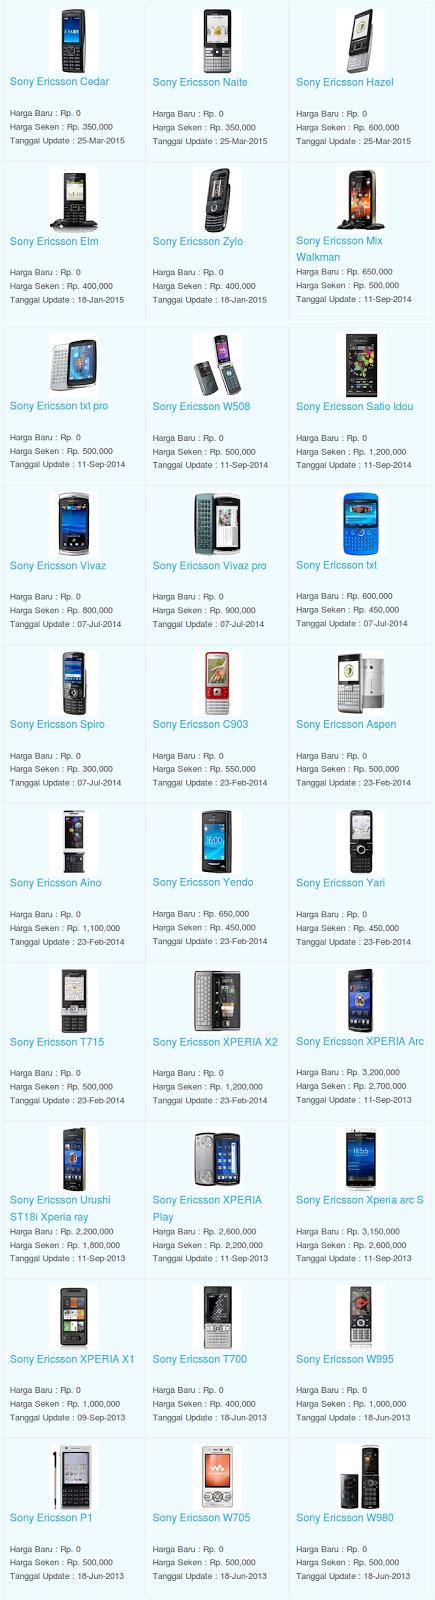 Daftar Terbaru Harga Hp Sony Ericsson Oktober 2015